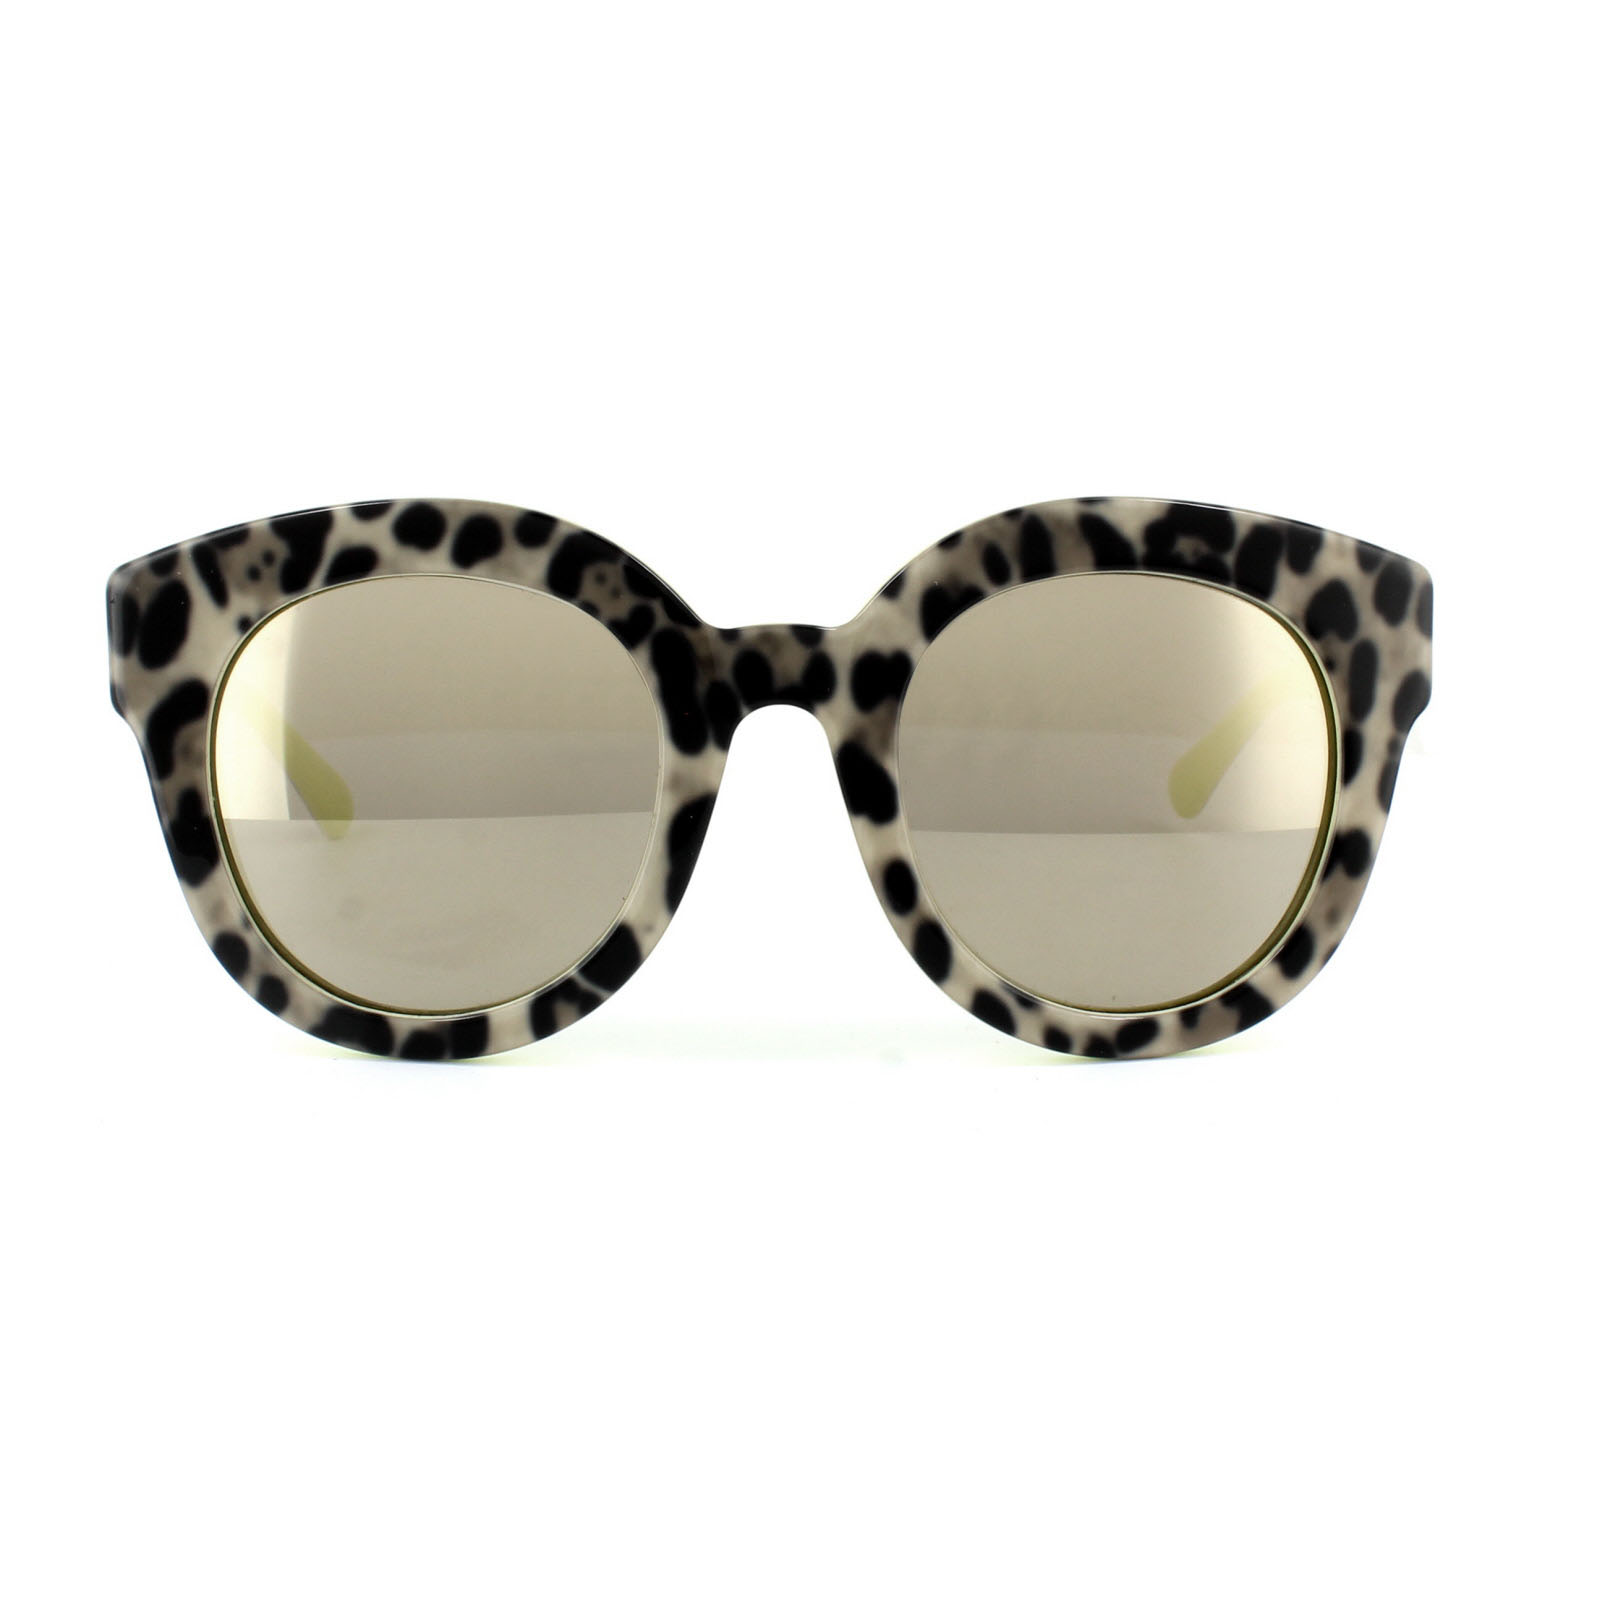 Gafas estampado con 28616g de Gabbana amarillo de 4235 sol oro leopardo Espejo Sentinel de Dolce rrqRSZw